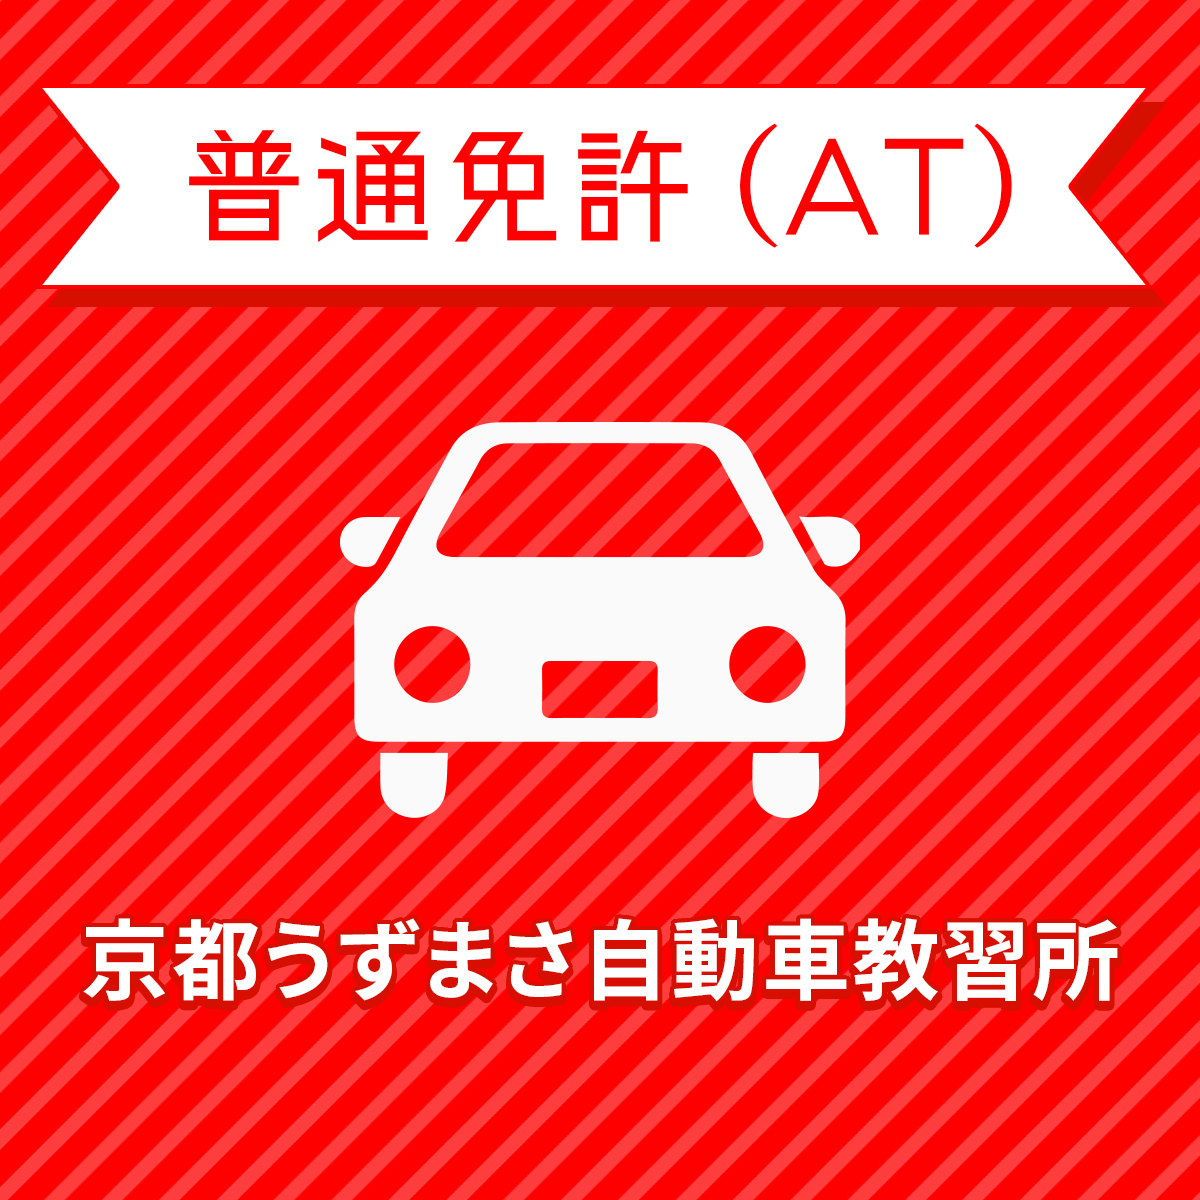 【京都府京都市】普通車ATコース(一般料金)<免許なし/原付免許所持対象>